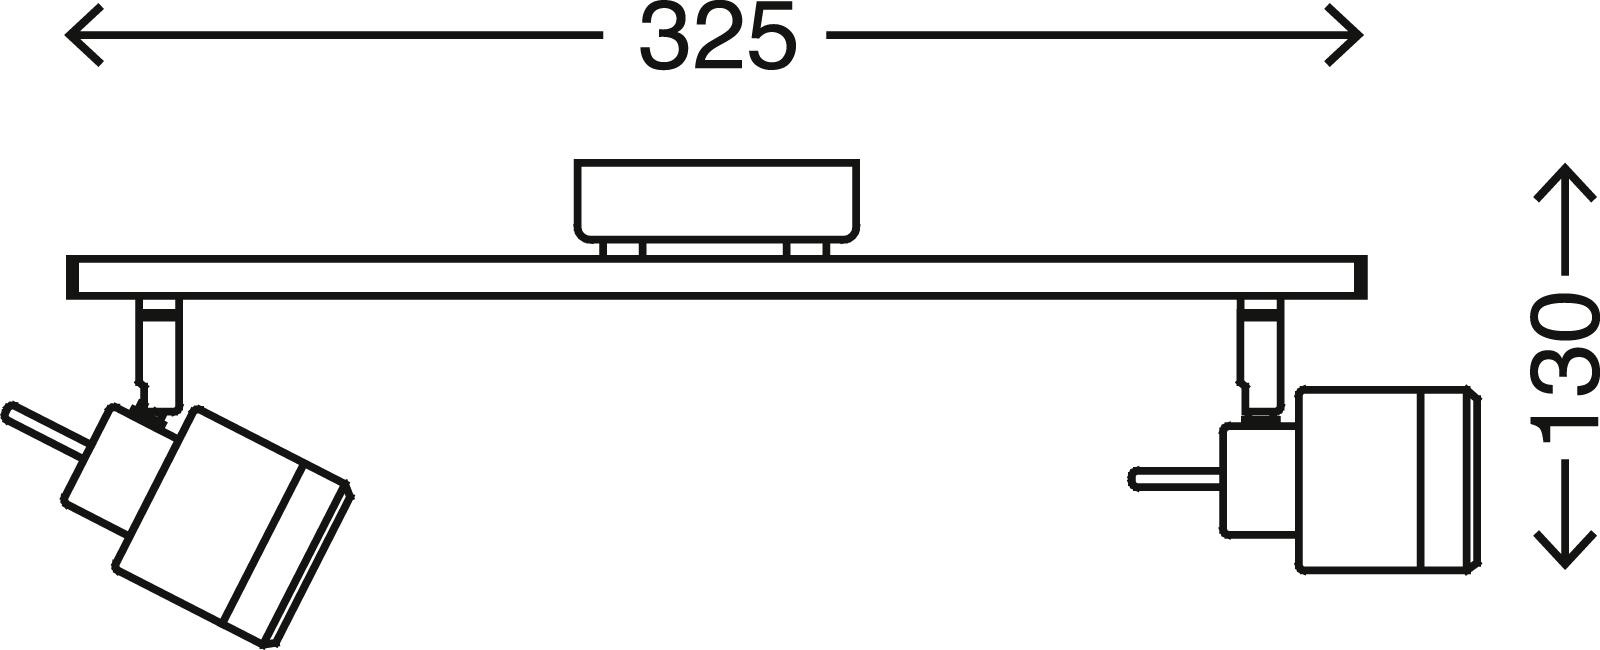 LED Spot Deckenleuchte, 32,5 cm, 8 W, Chrom